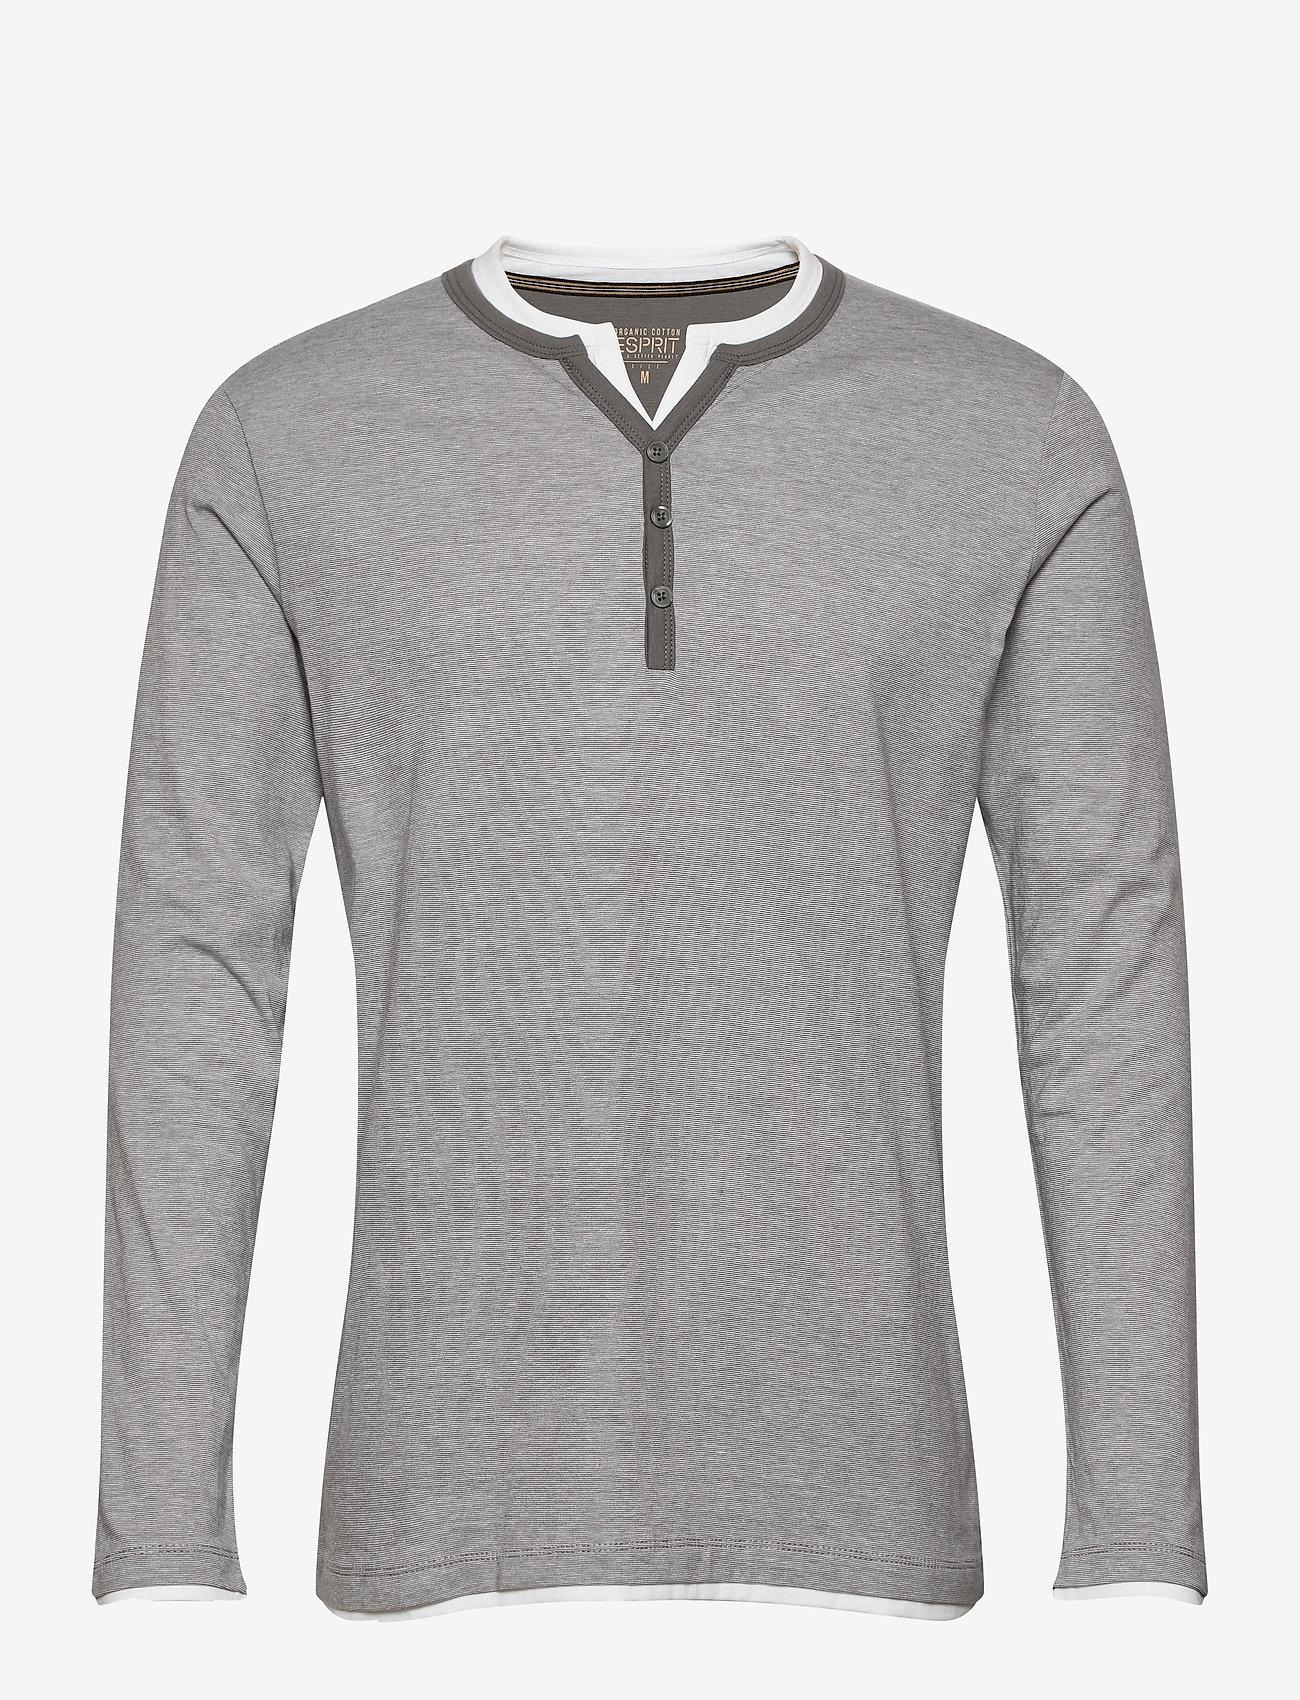 Esprit Casual - T-Shirts - basic t-shirts - medium grey 3 - 0